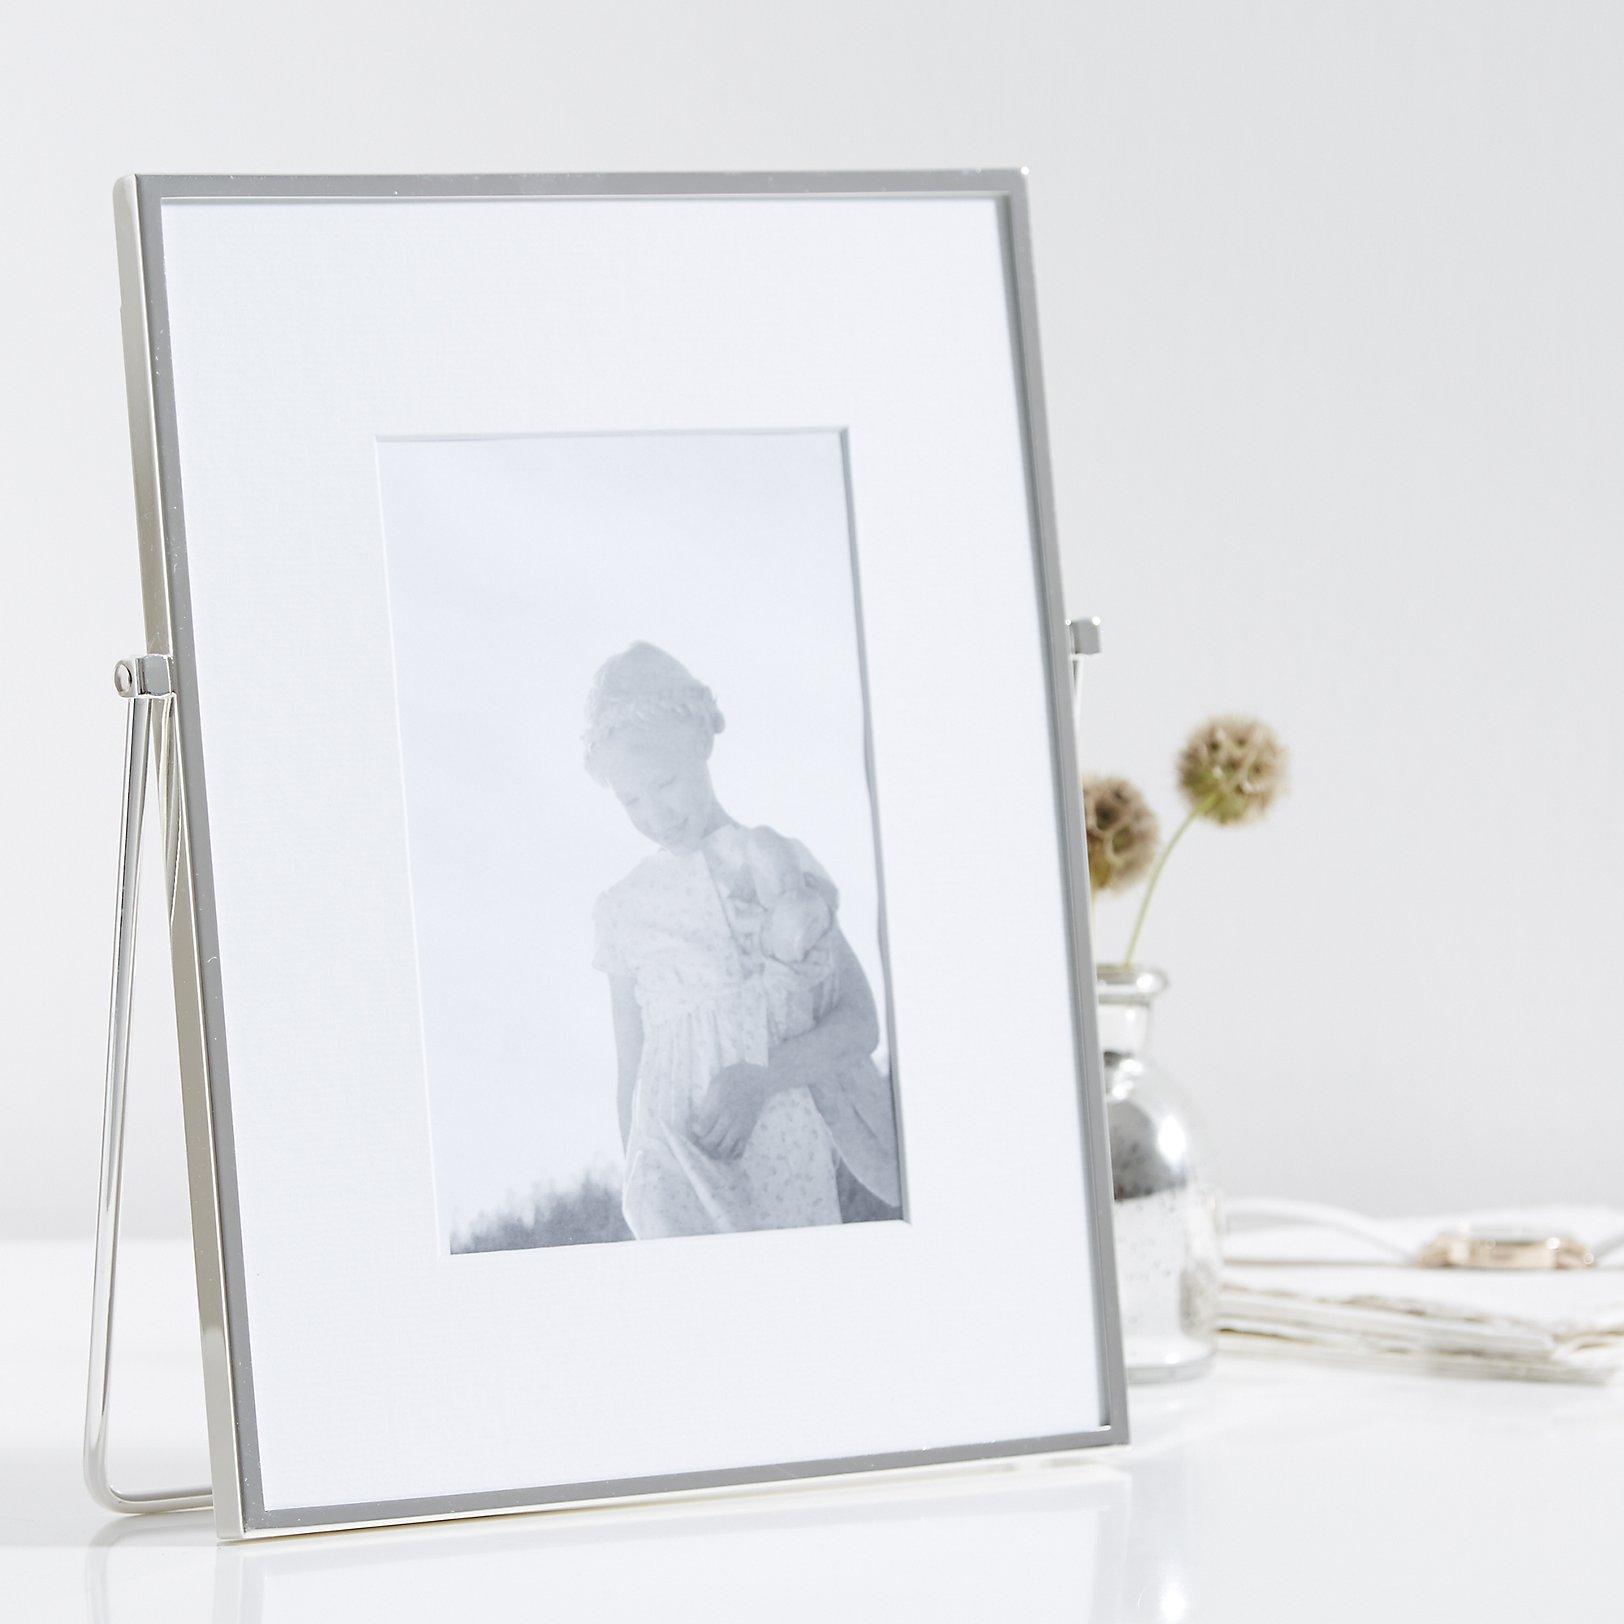 Silver 5x7 easel frame